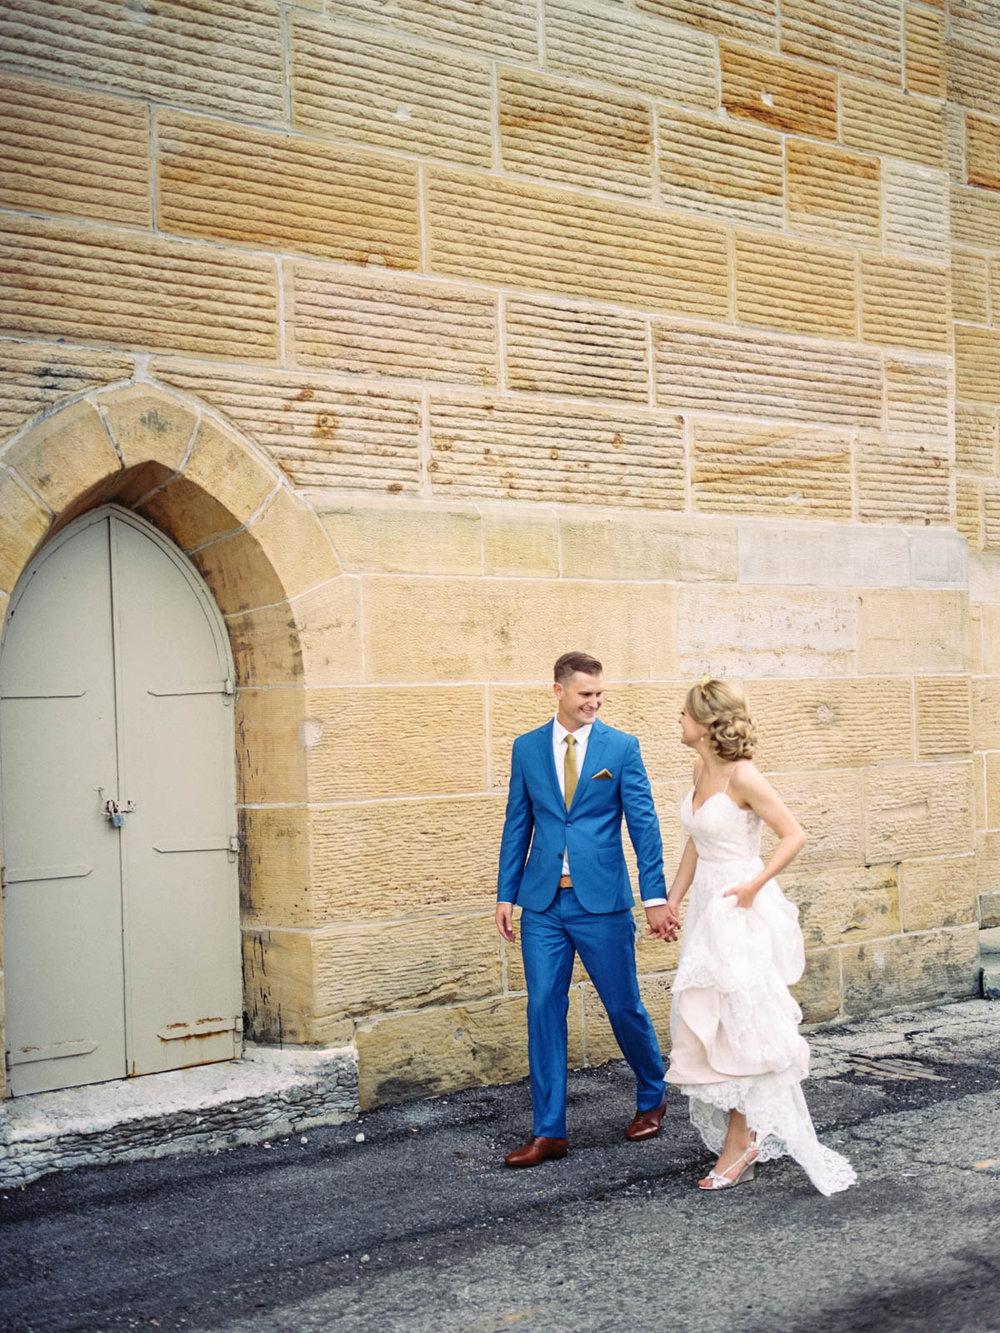 Romantic Columbus Wedding by Cleveland Wedding Photographer Matt Erickson Photography